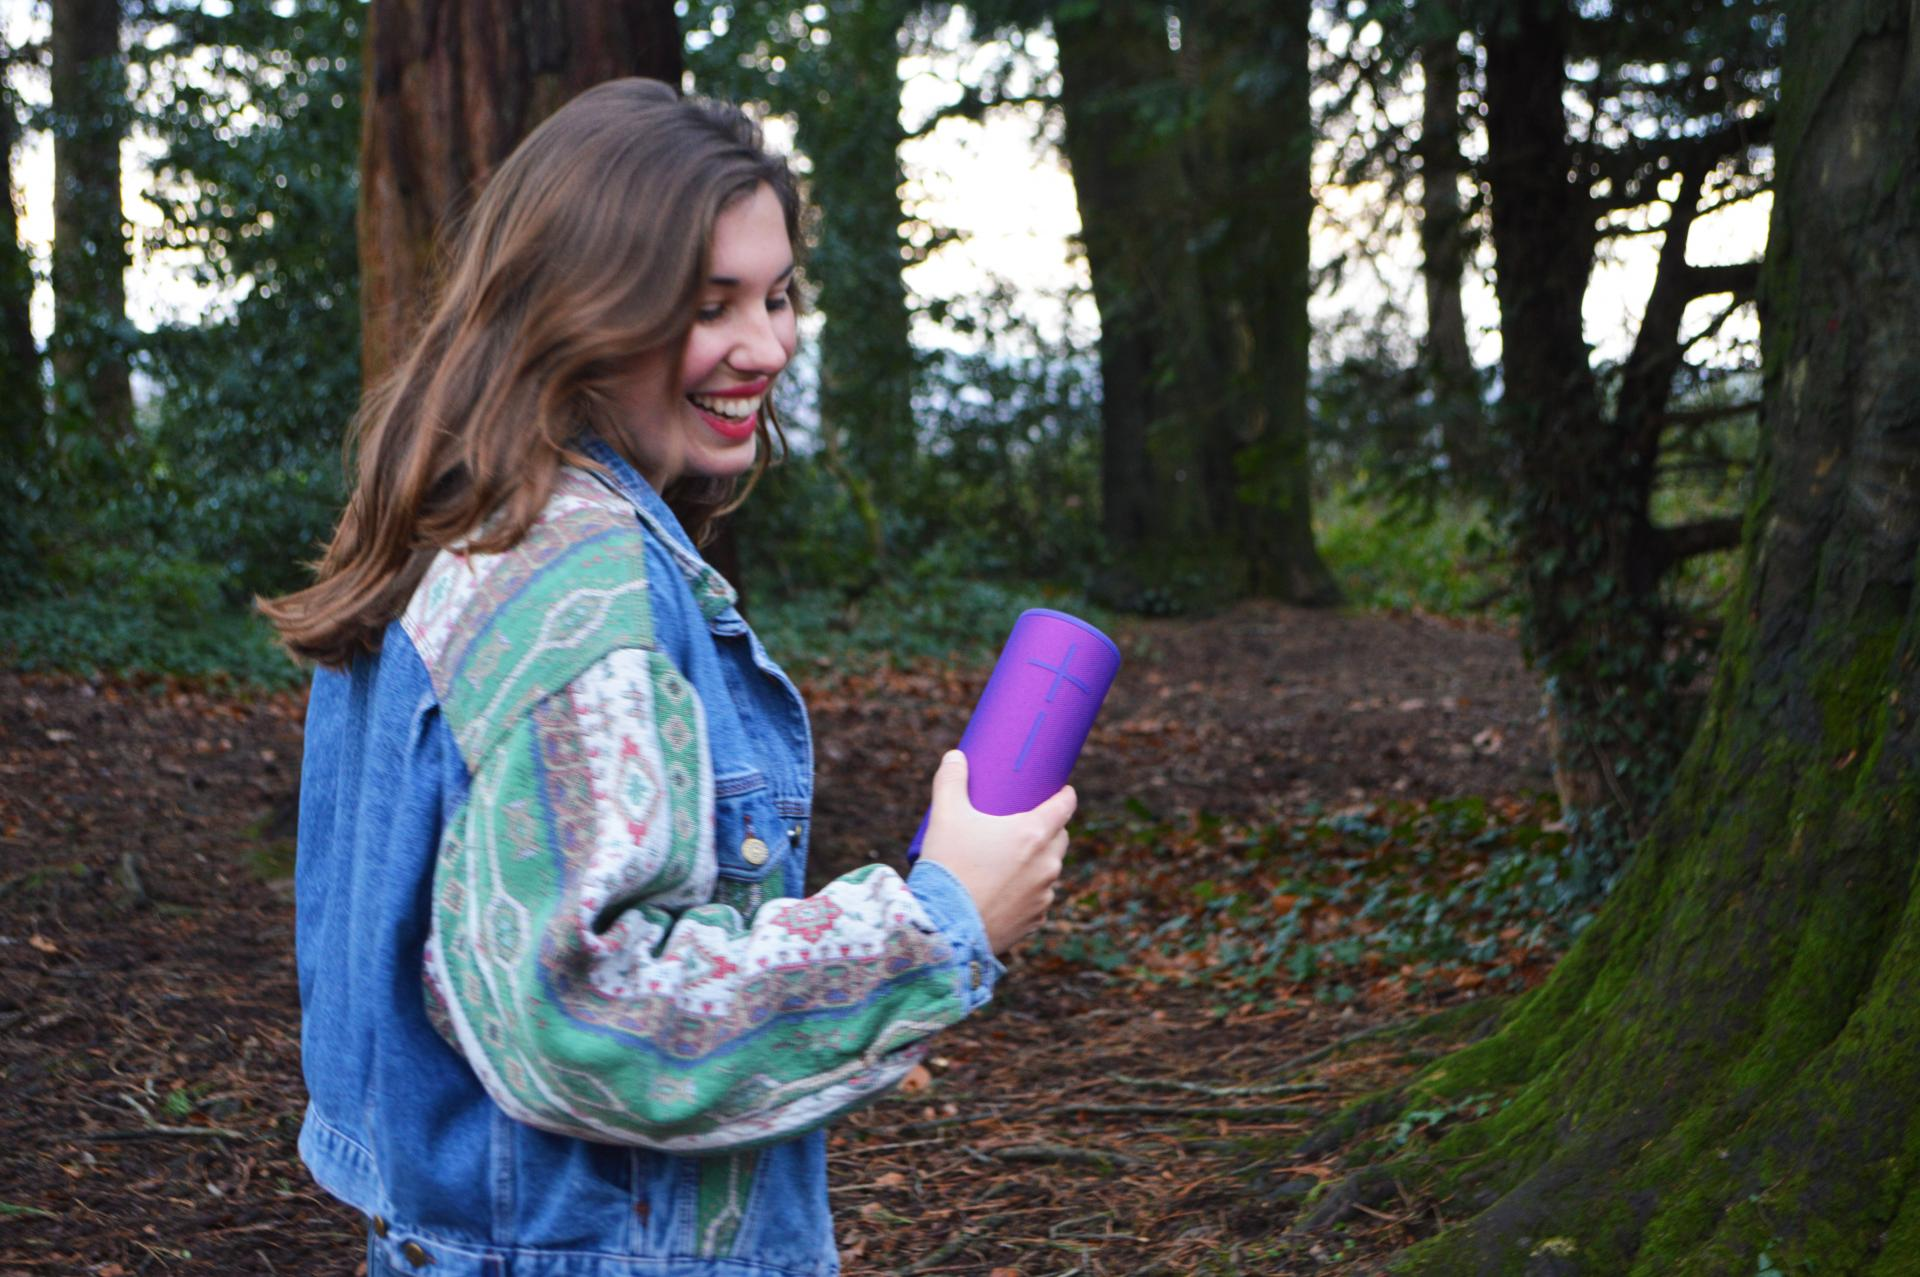 Christmas competition: Win an Ultimate Ears Boom 3 waterproof speaker